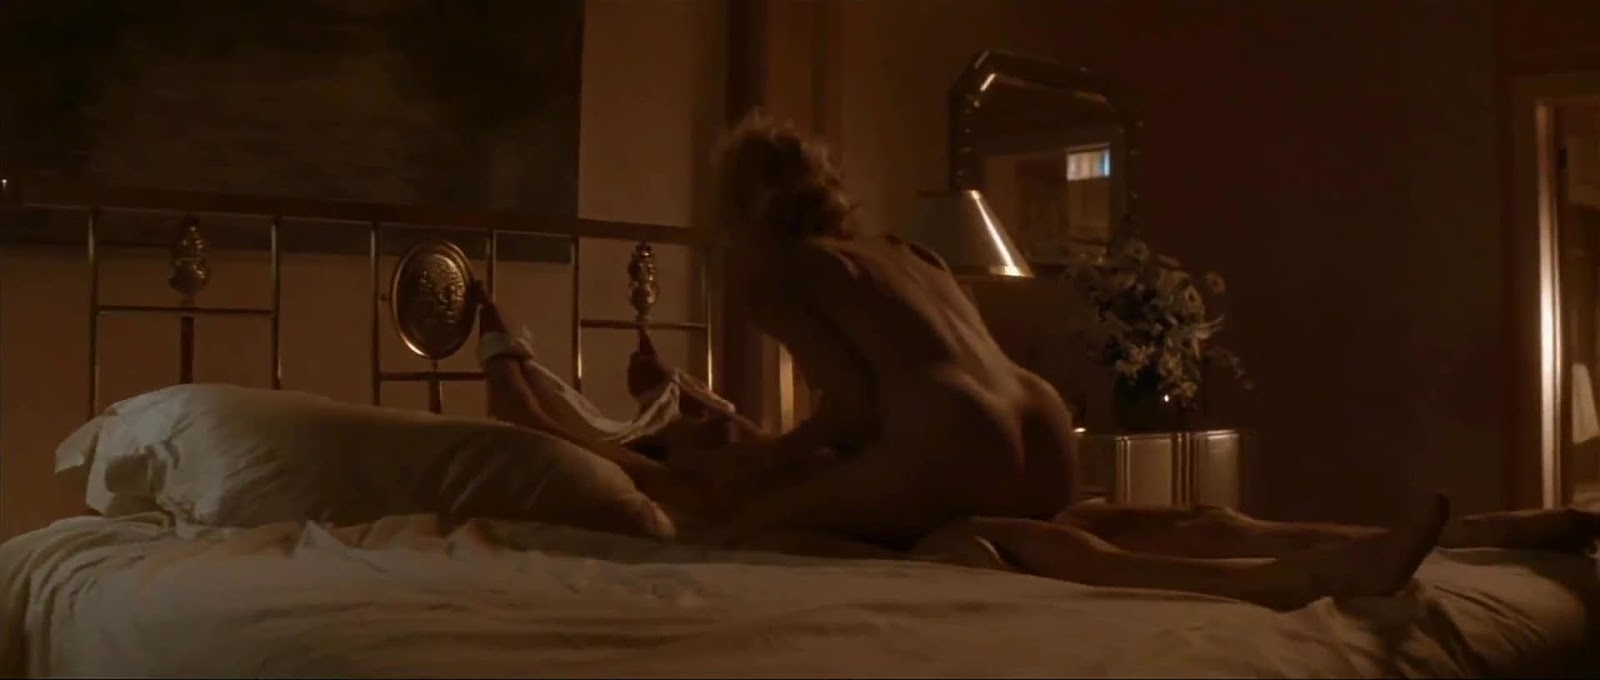 Fotos De Sharon Stone Desnuda En Instinto B Sico